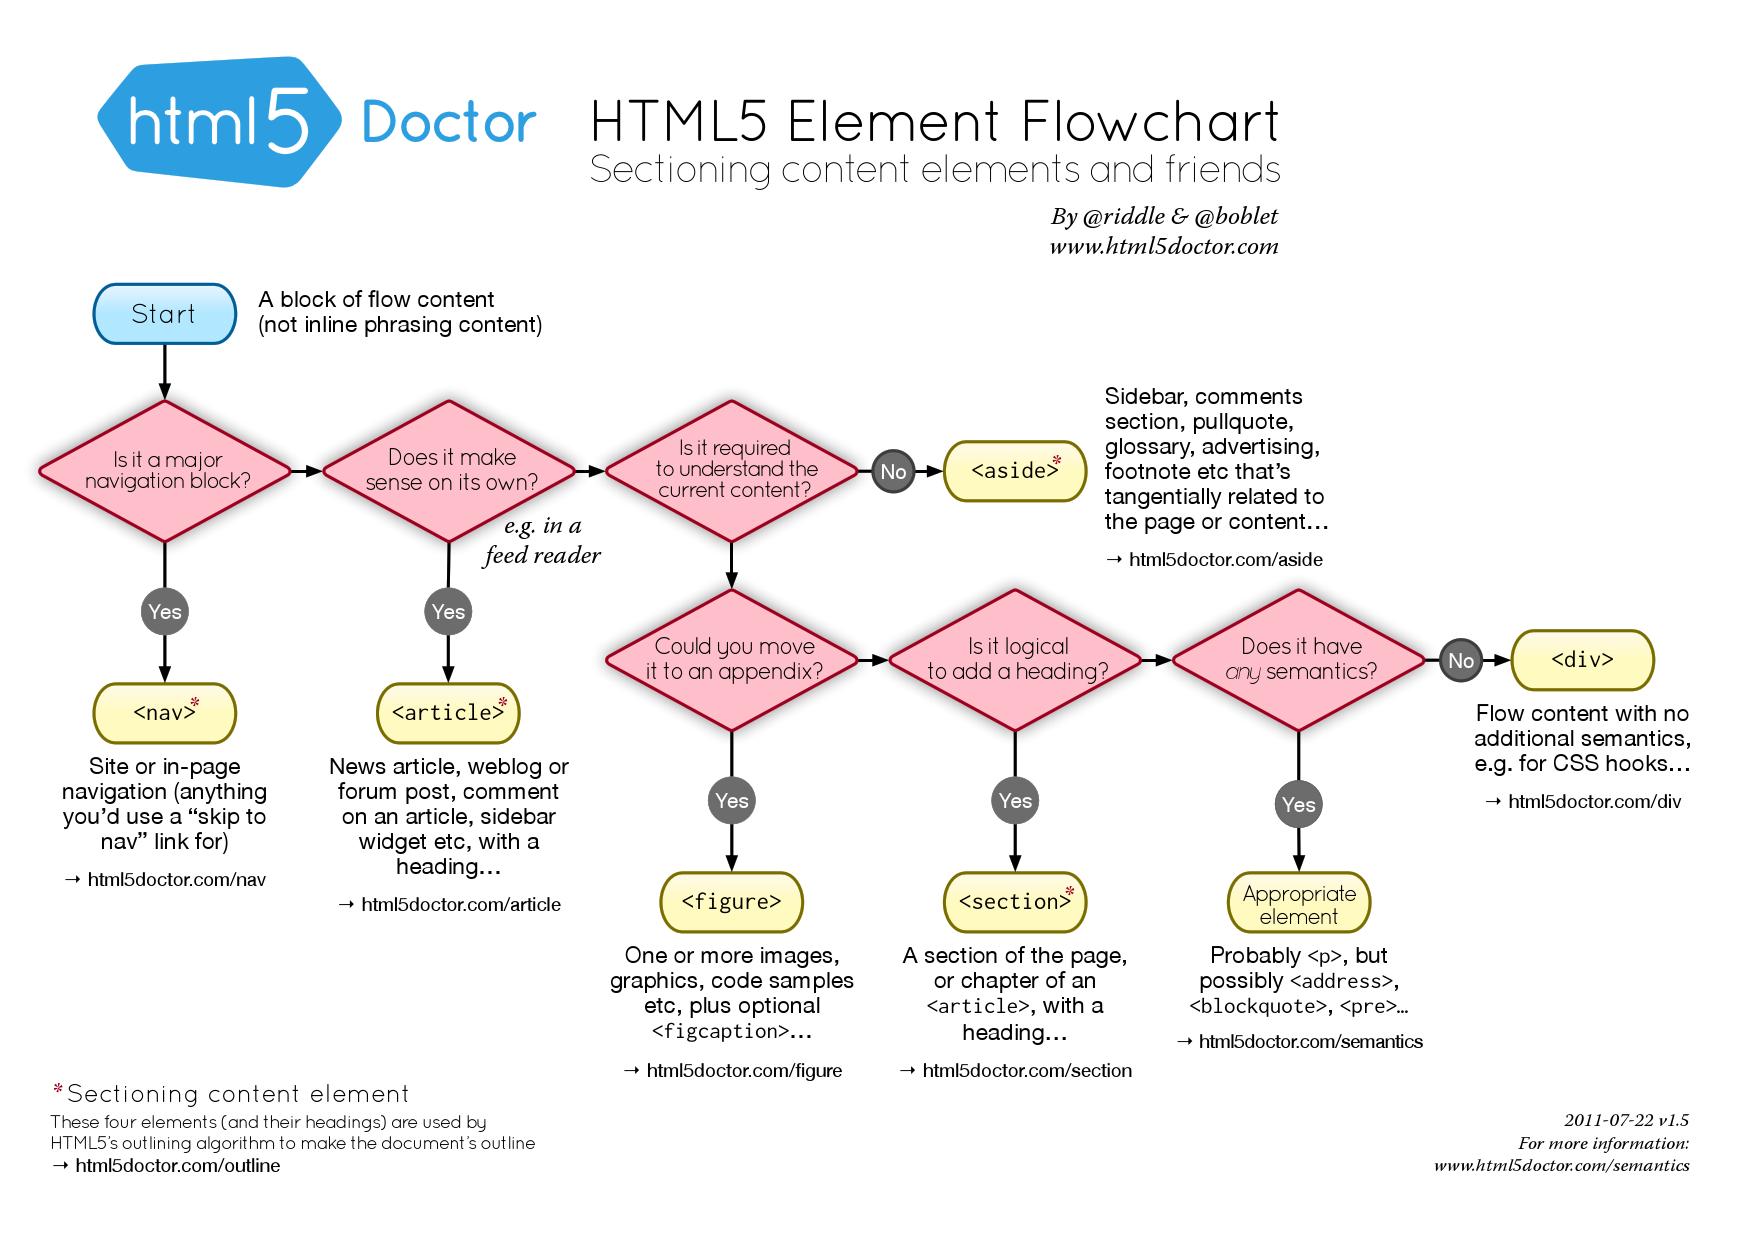 CS204: Introduction to Front-End Web Development